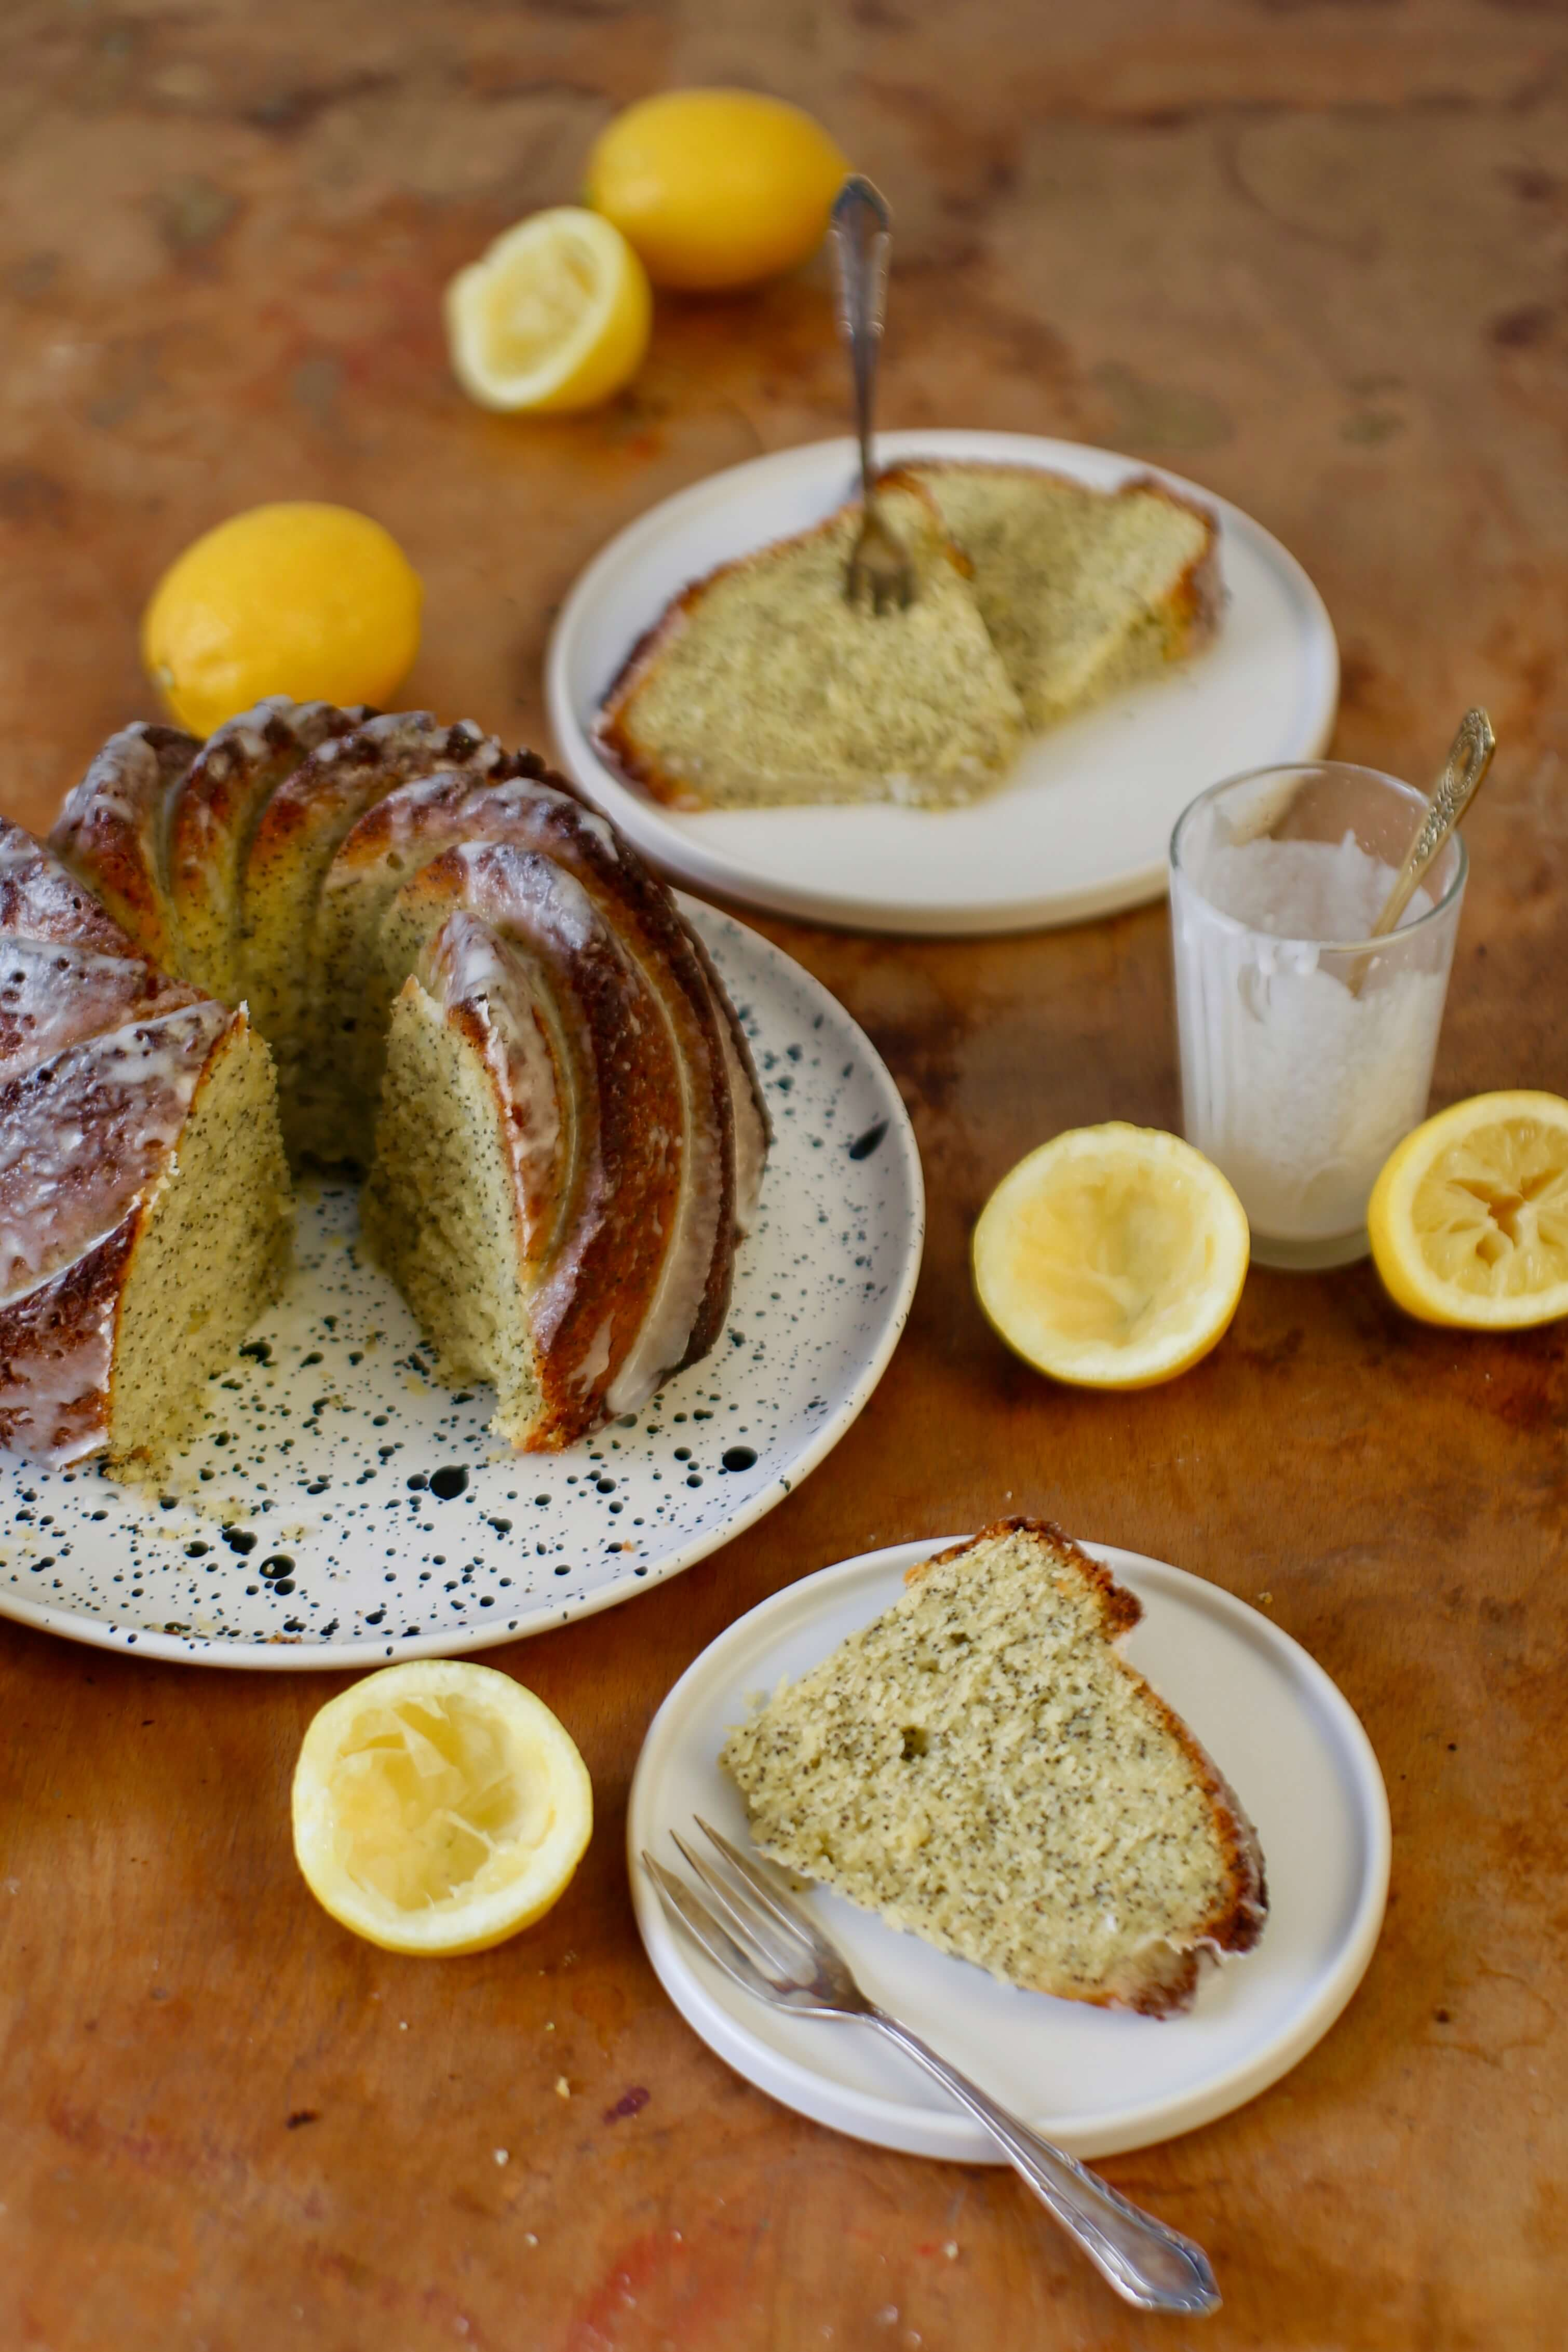 Saftiger und schneller Zitronen-Mohn-Gugelhupf. #laktosefrei | chilibluetendotcom